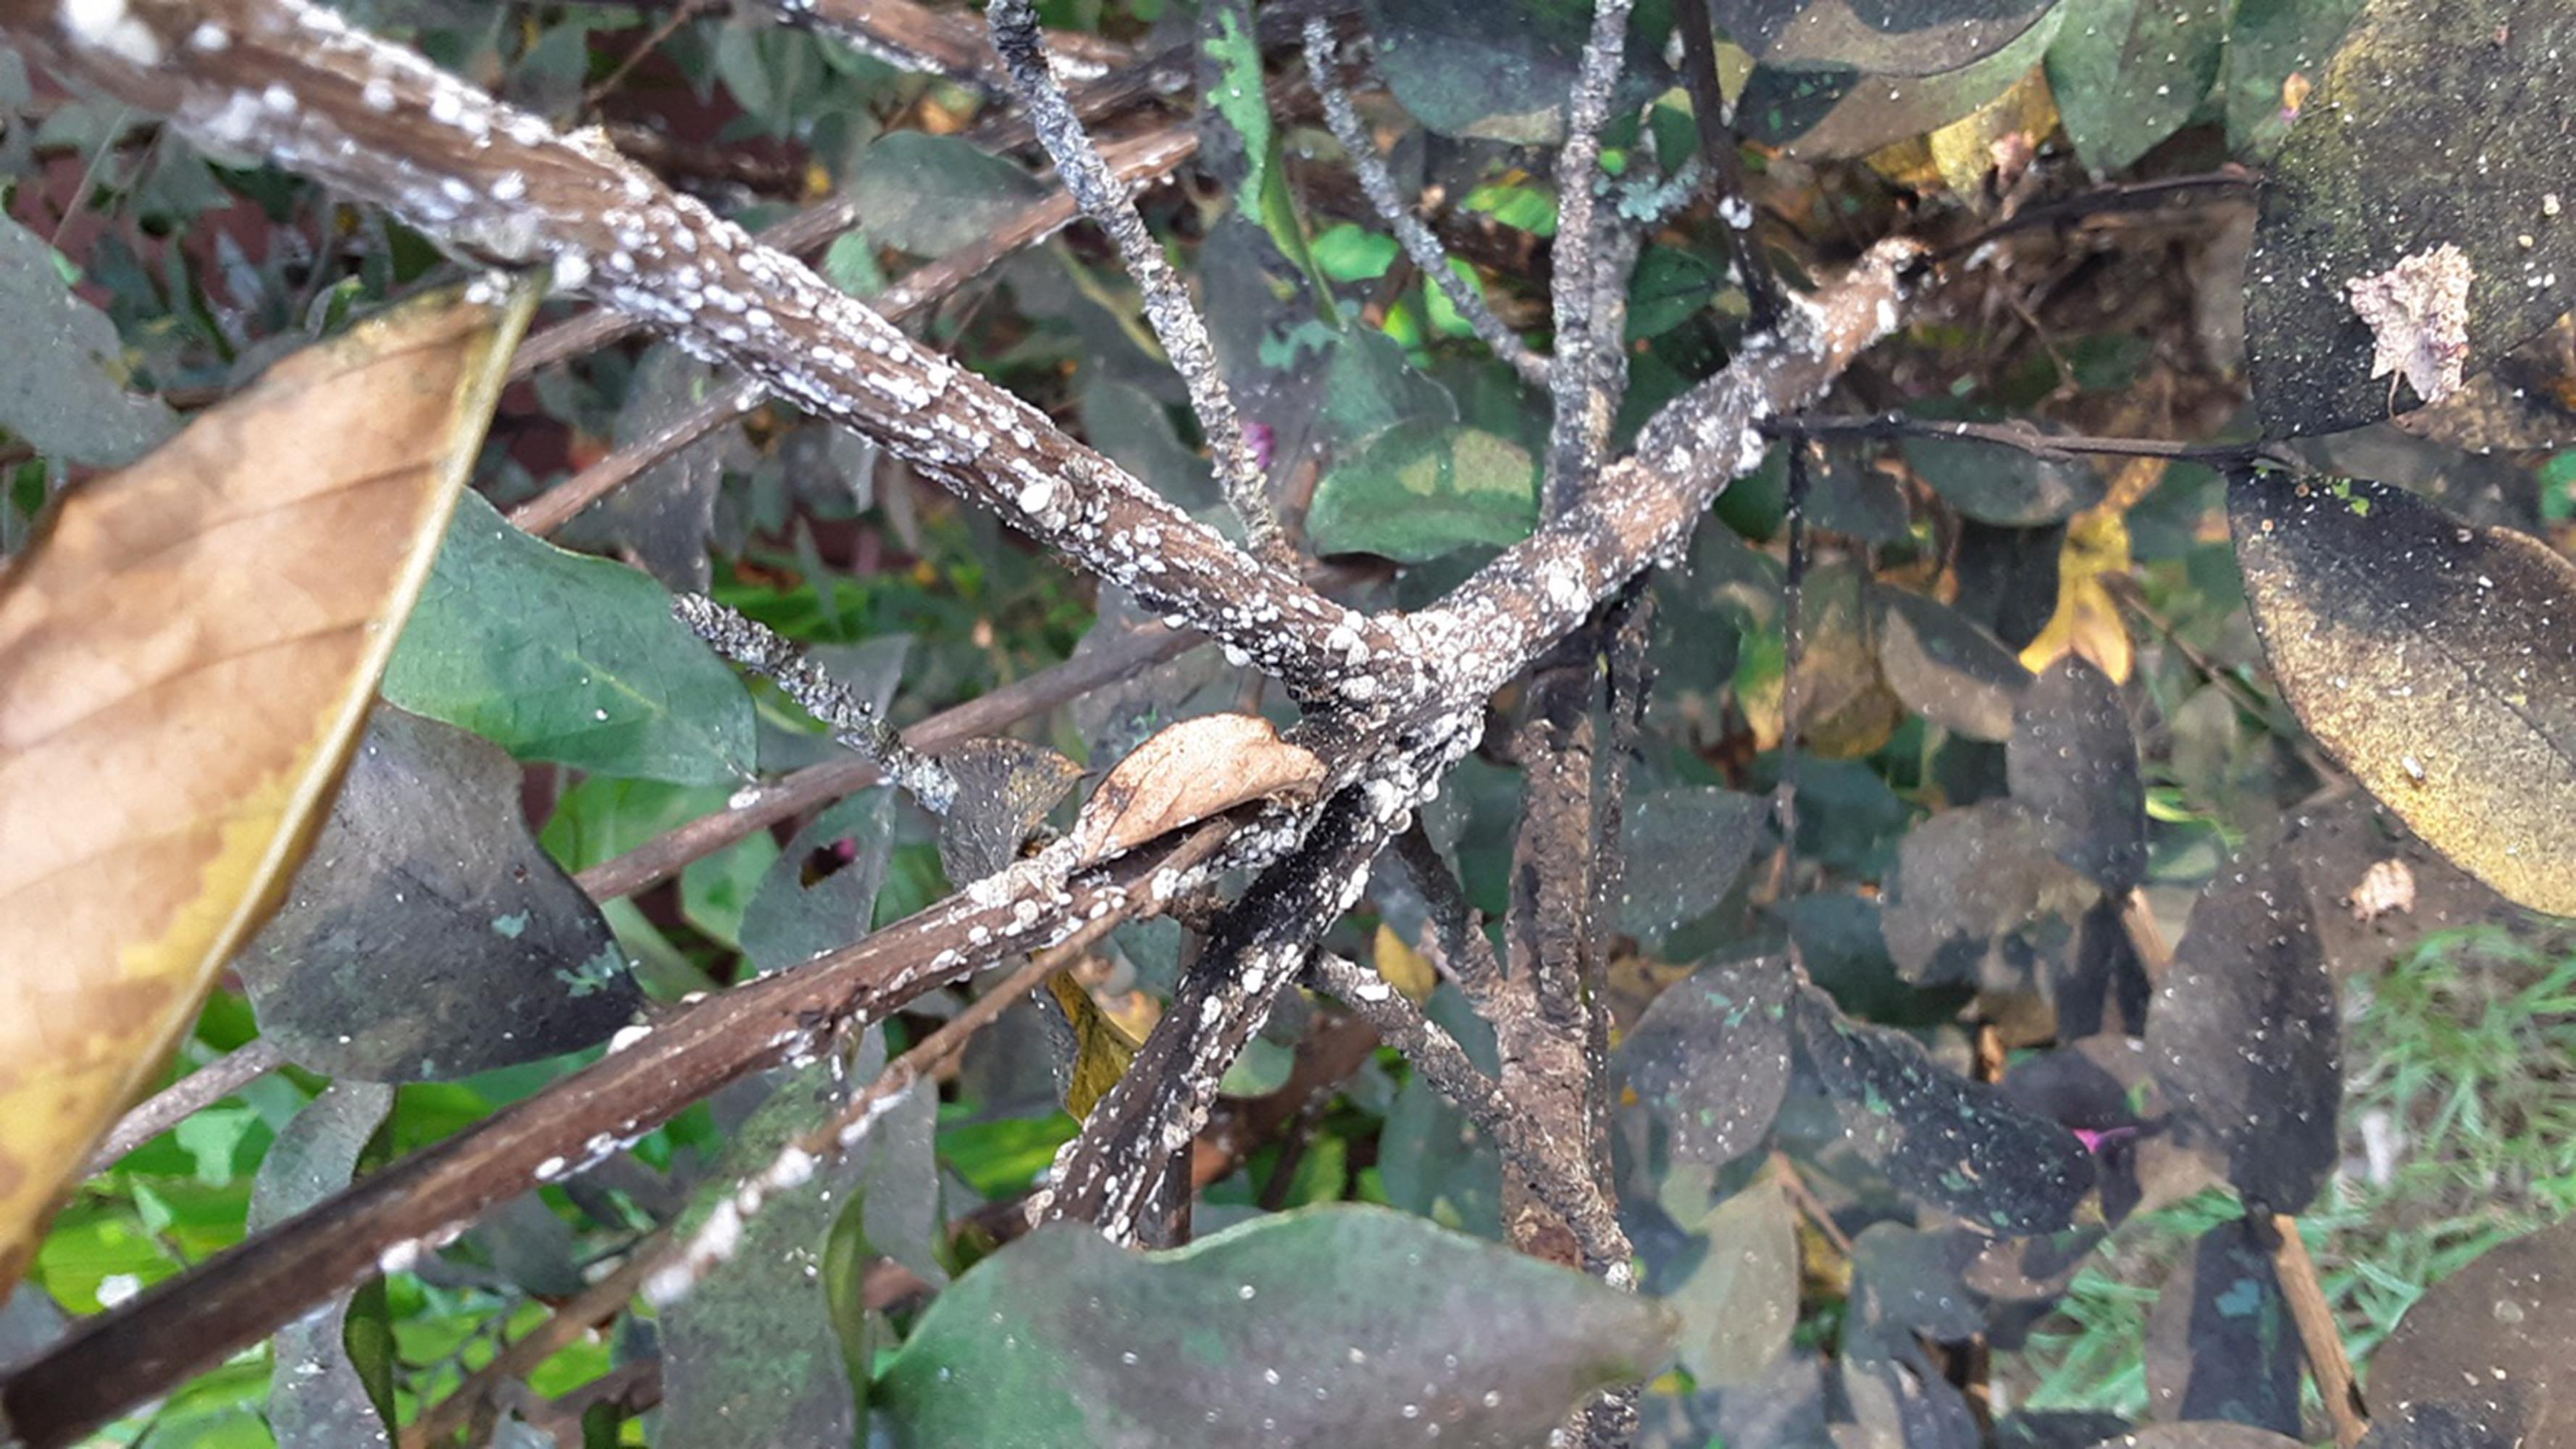 IN THE GARDEN: Crape myrtles, 'Endless Summer' hydrangeas, okra and more